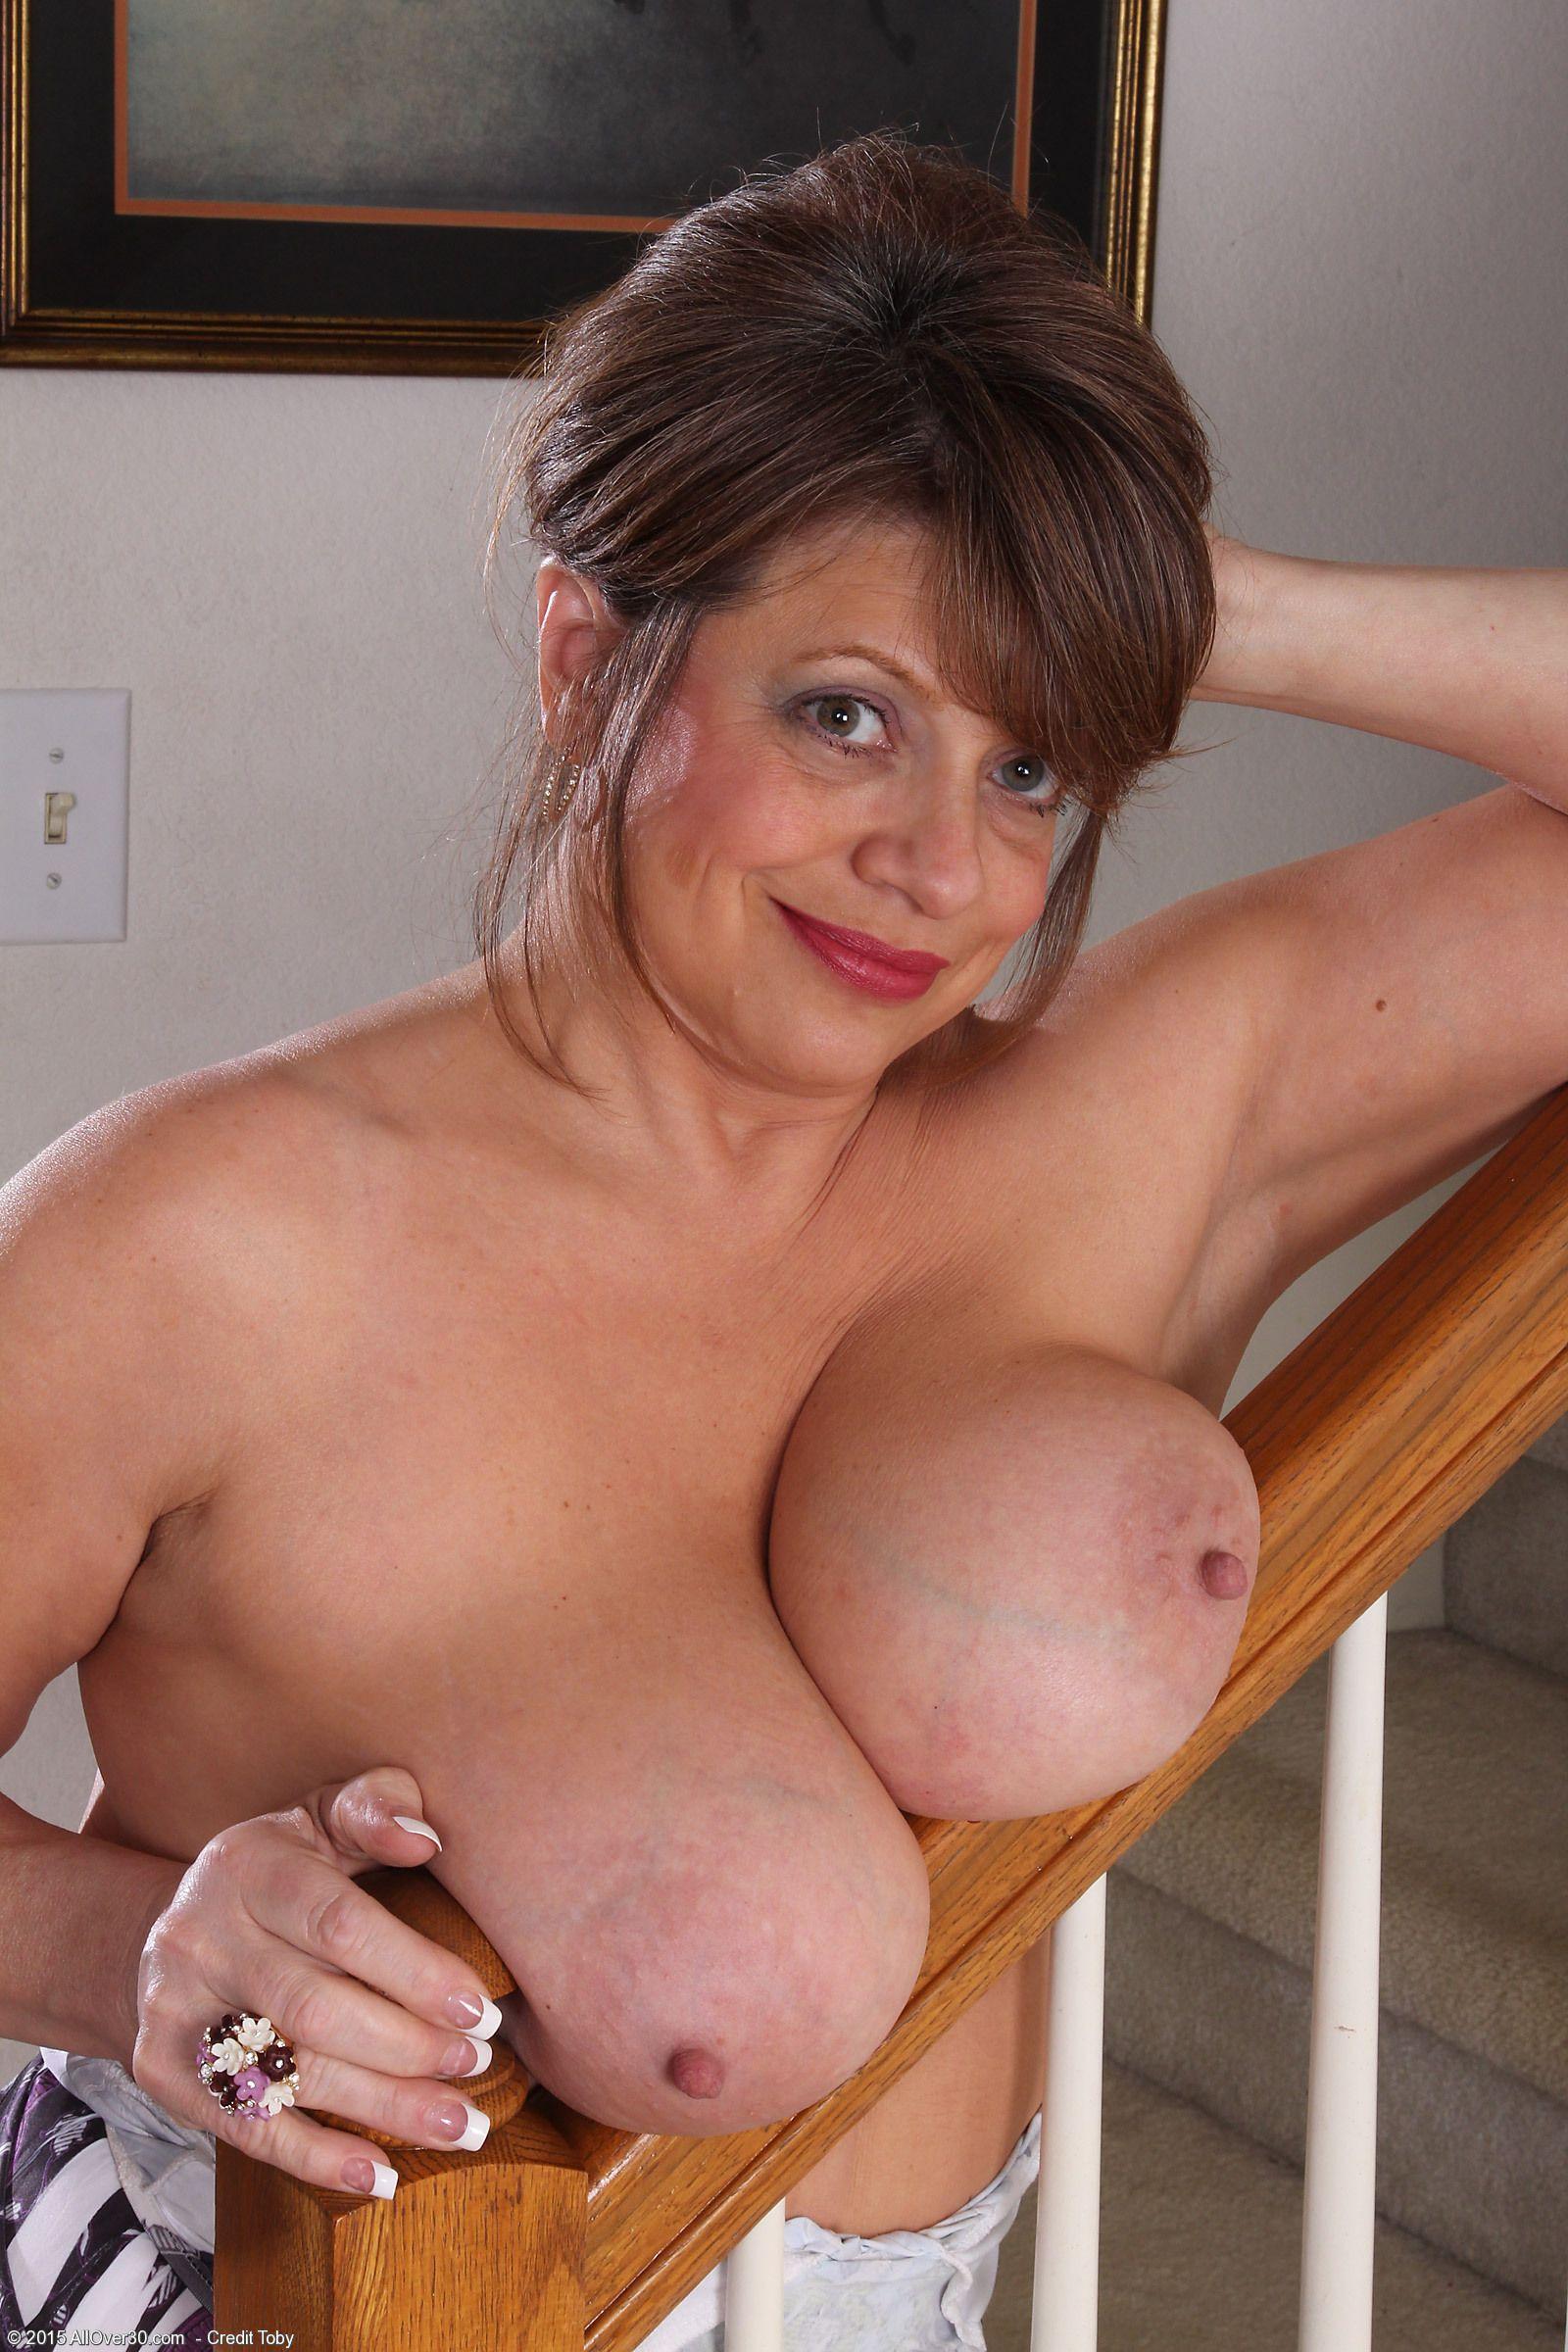 Mia kirshner nude videos